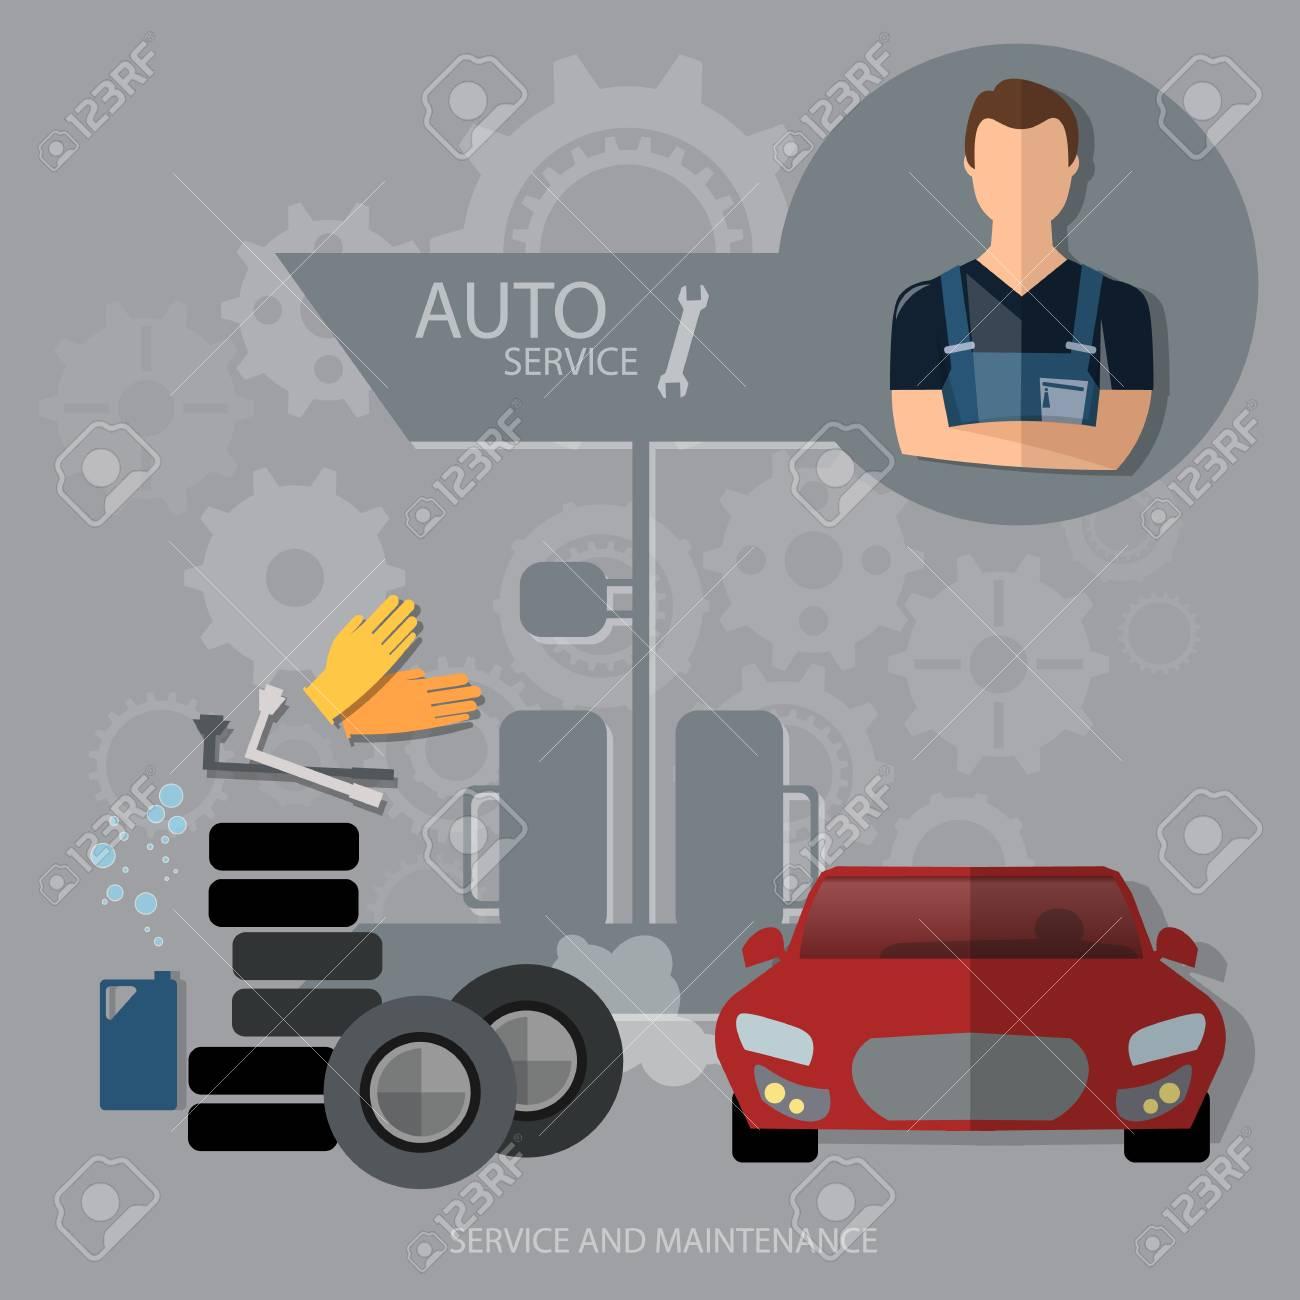 auto service concept car diagnostics tire oil change professional